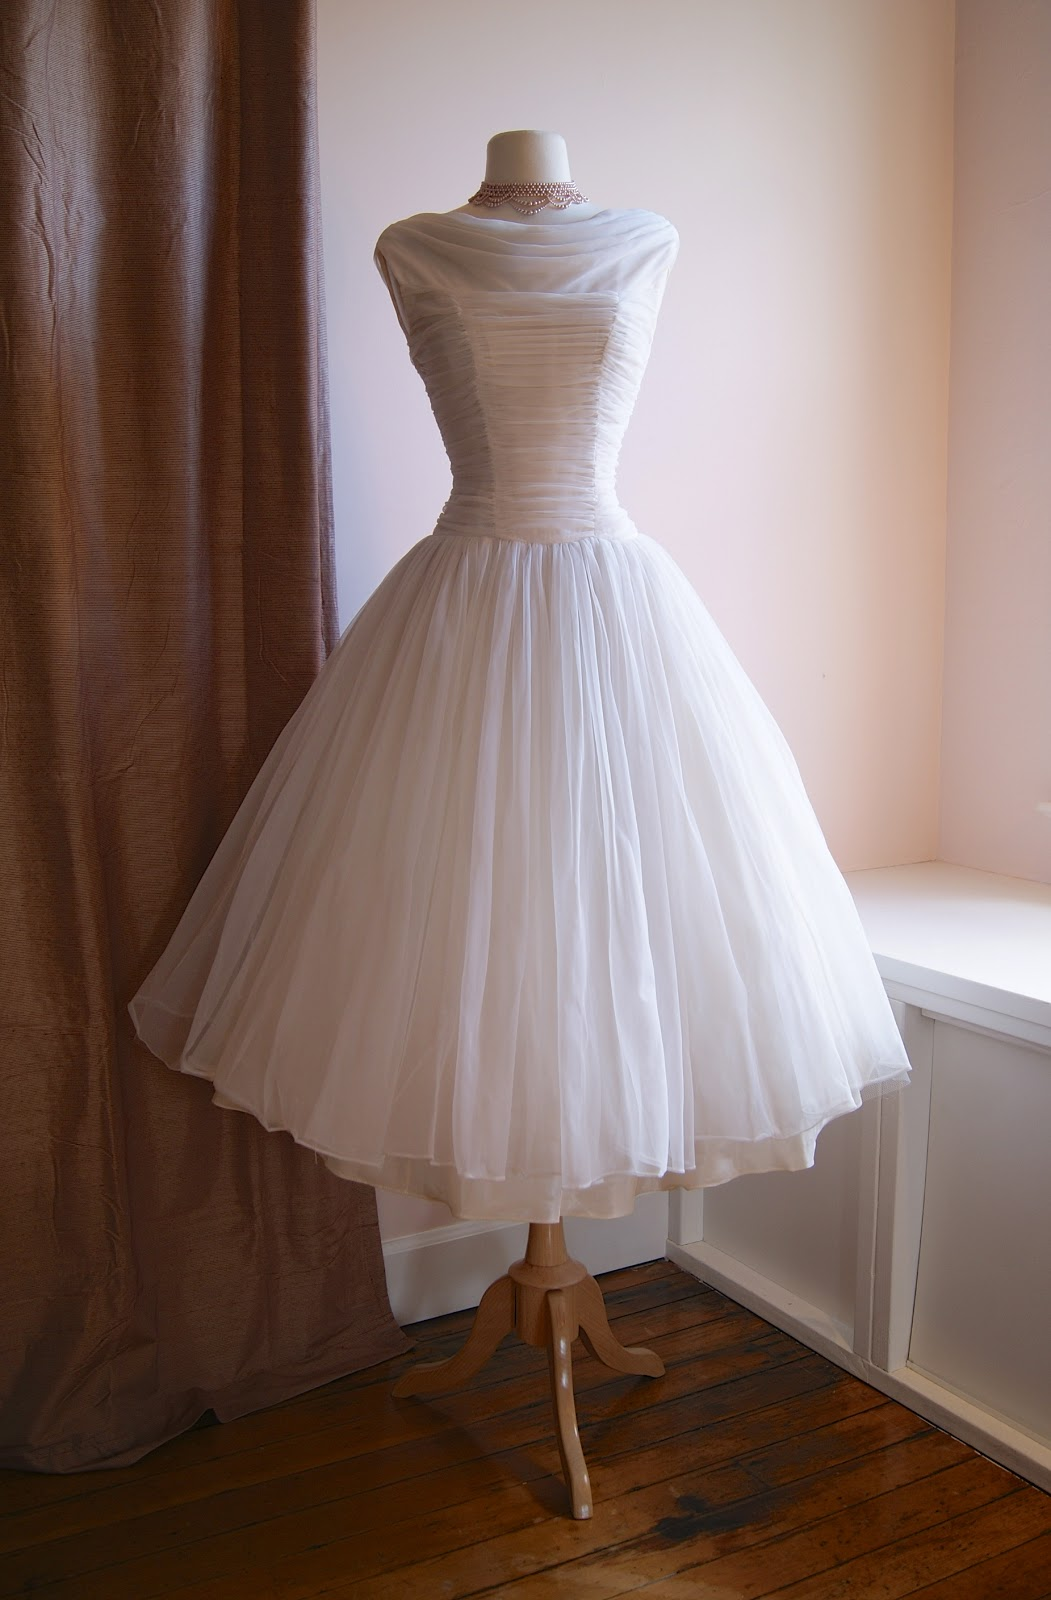 Xtabay vintage clothing boutique portland oregon for Wedding dresses in portland oregon